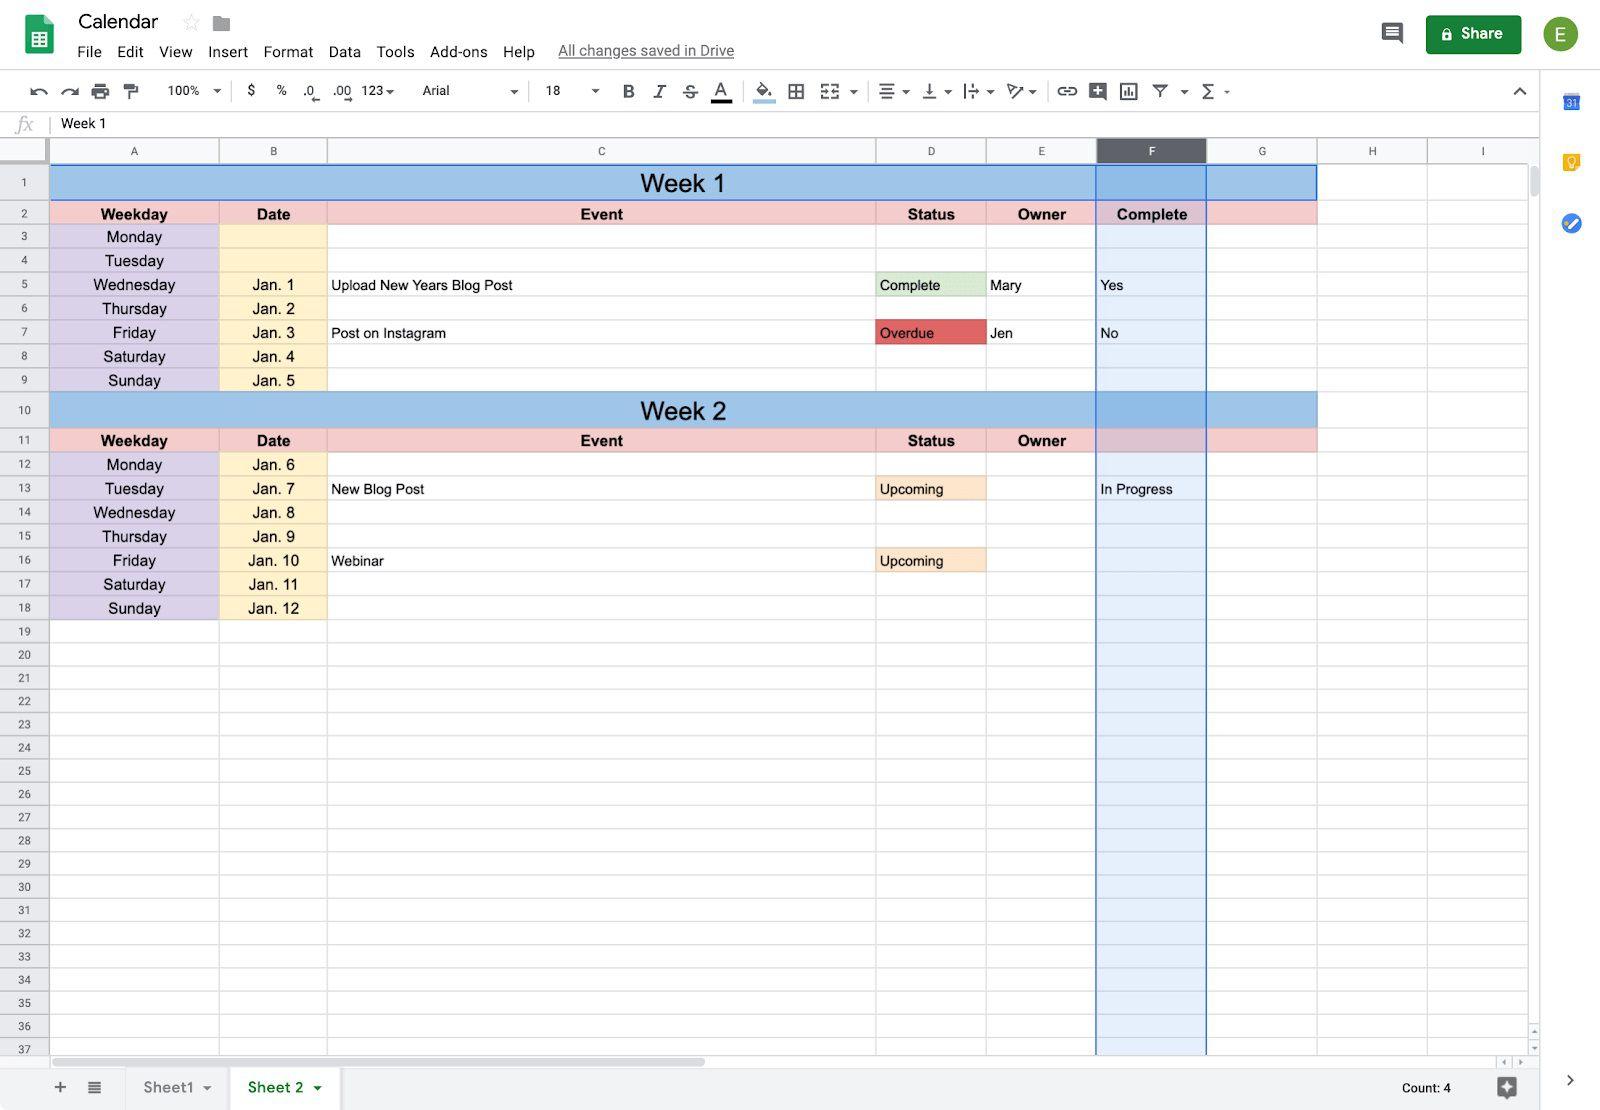 002 Amazing Calendar Template Google Doc Example  Docs Editable Two Week 2019-20Full